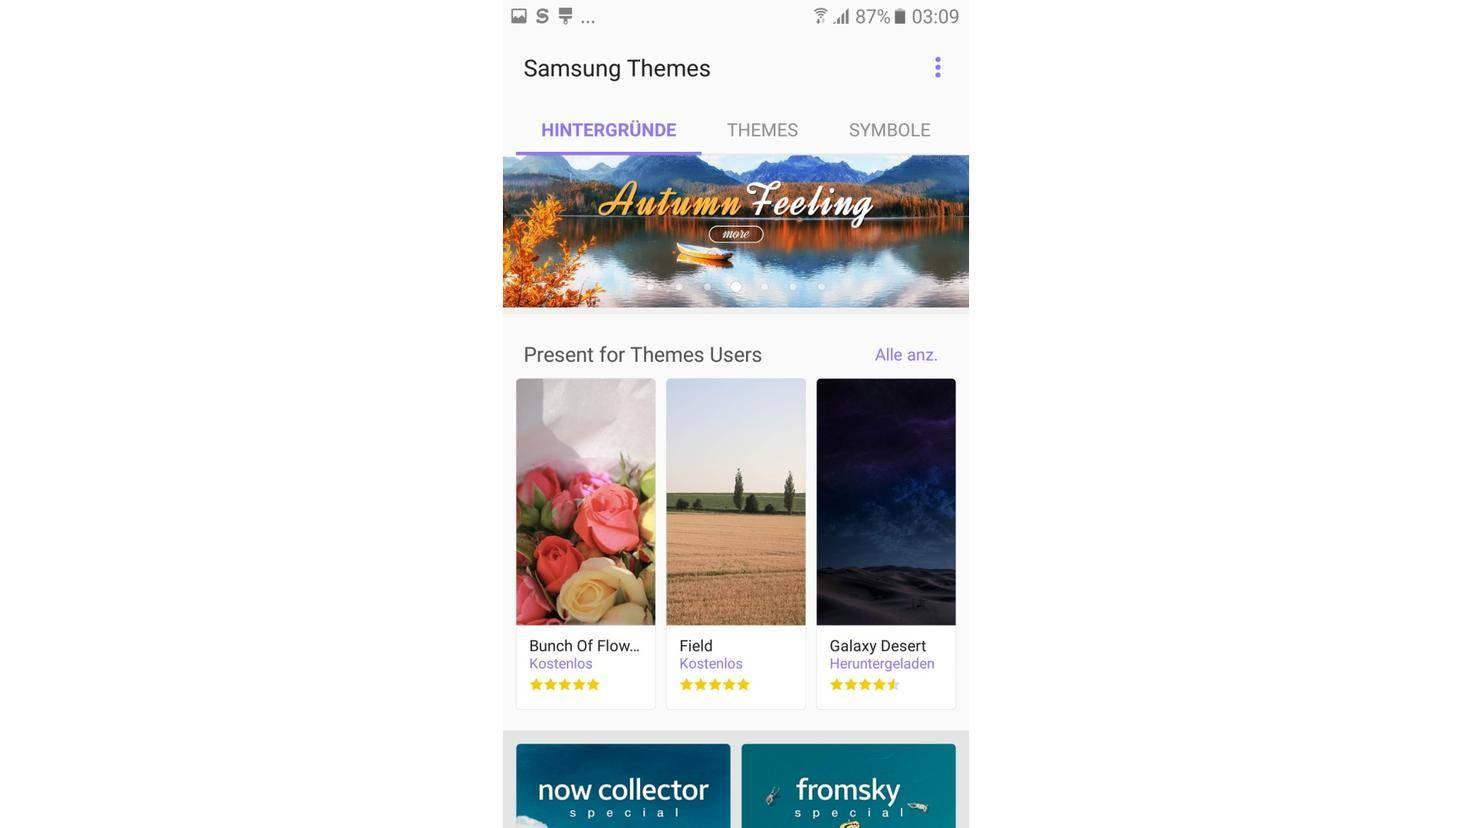 Screenshot Samsung Themes Galaxy A5 2017